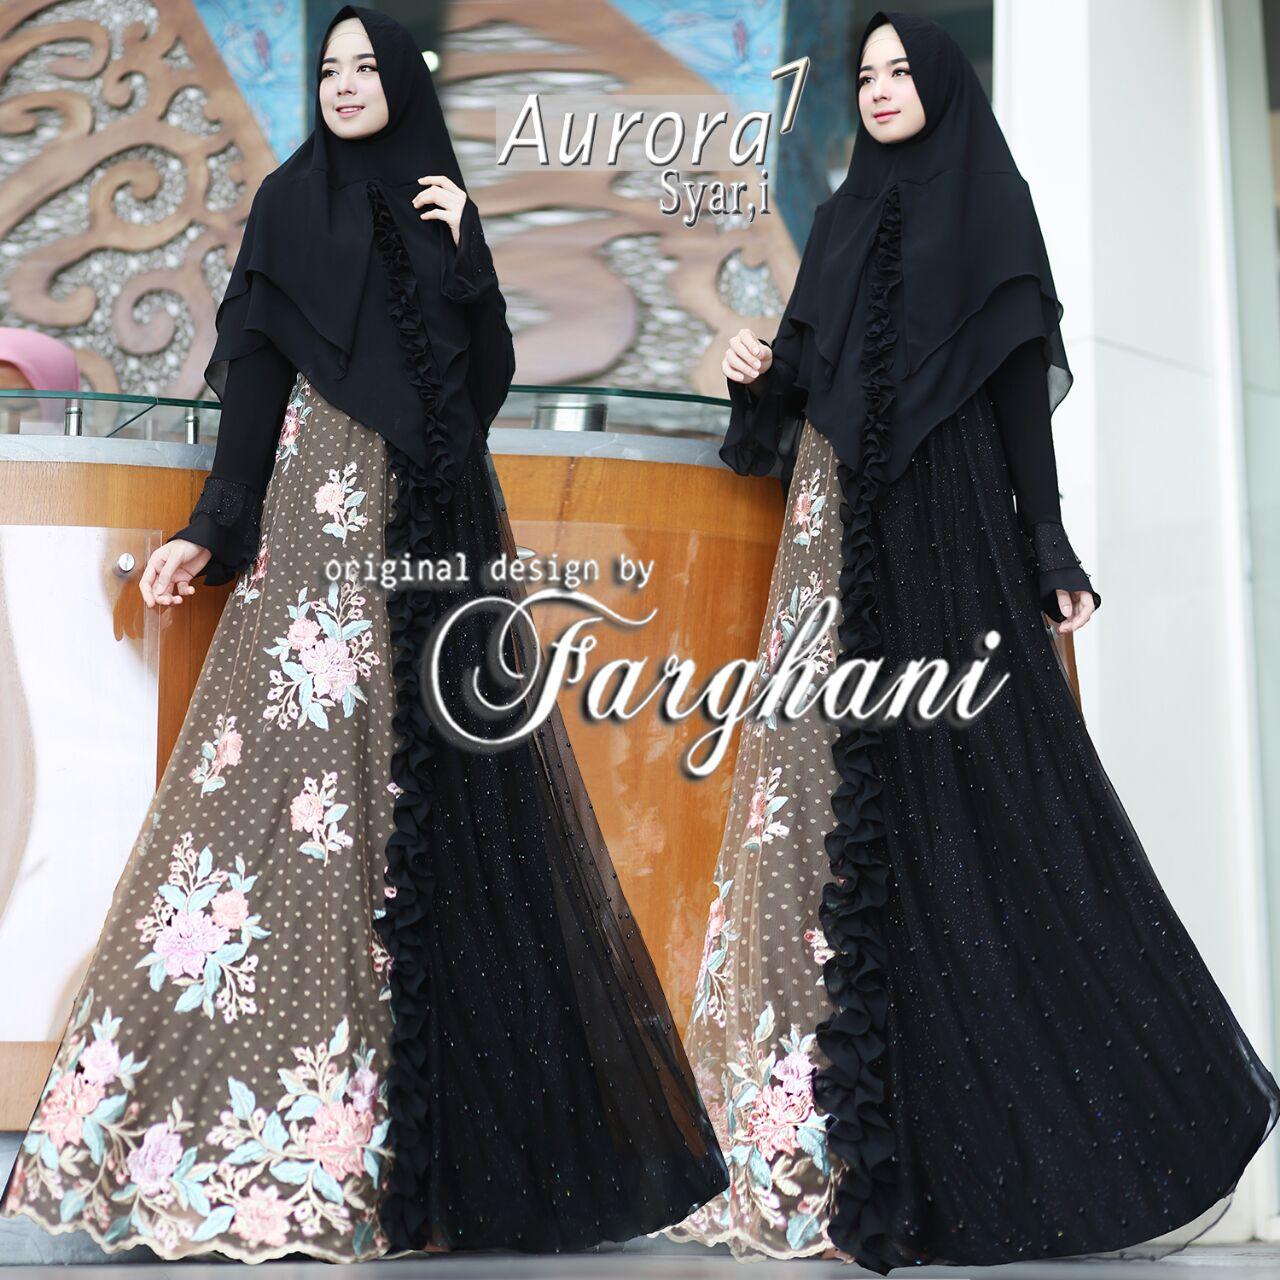 Aurora Long Skirt Warna Abu Daftar Harga Terbaru Dan Terupdate My Size Pants Pencil Abuaz492 Muda 3l 7 By Farghani